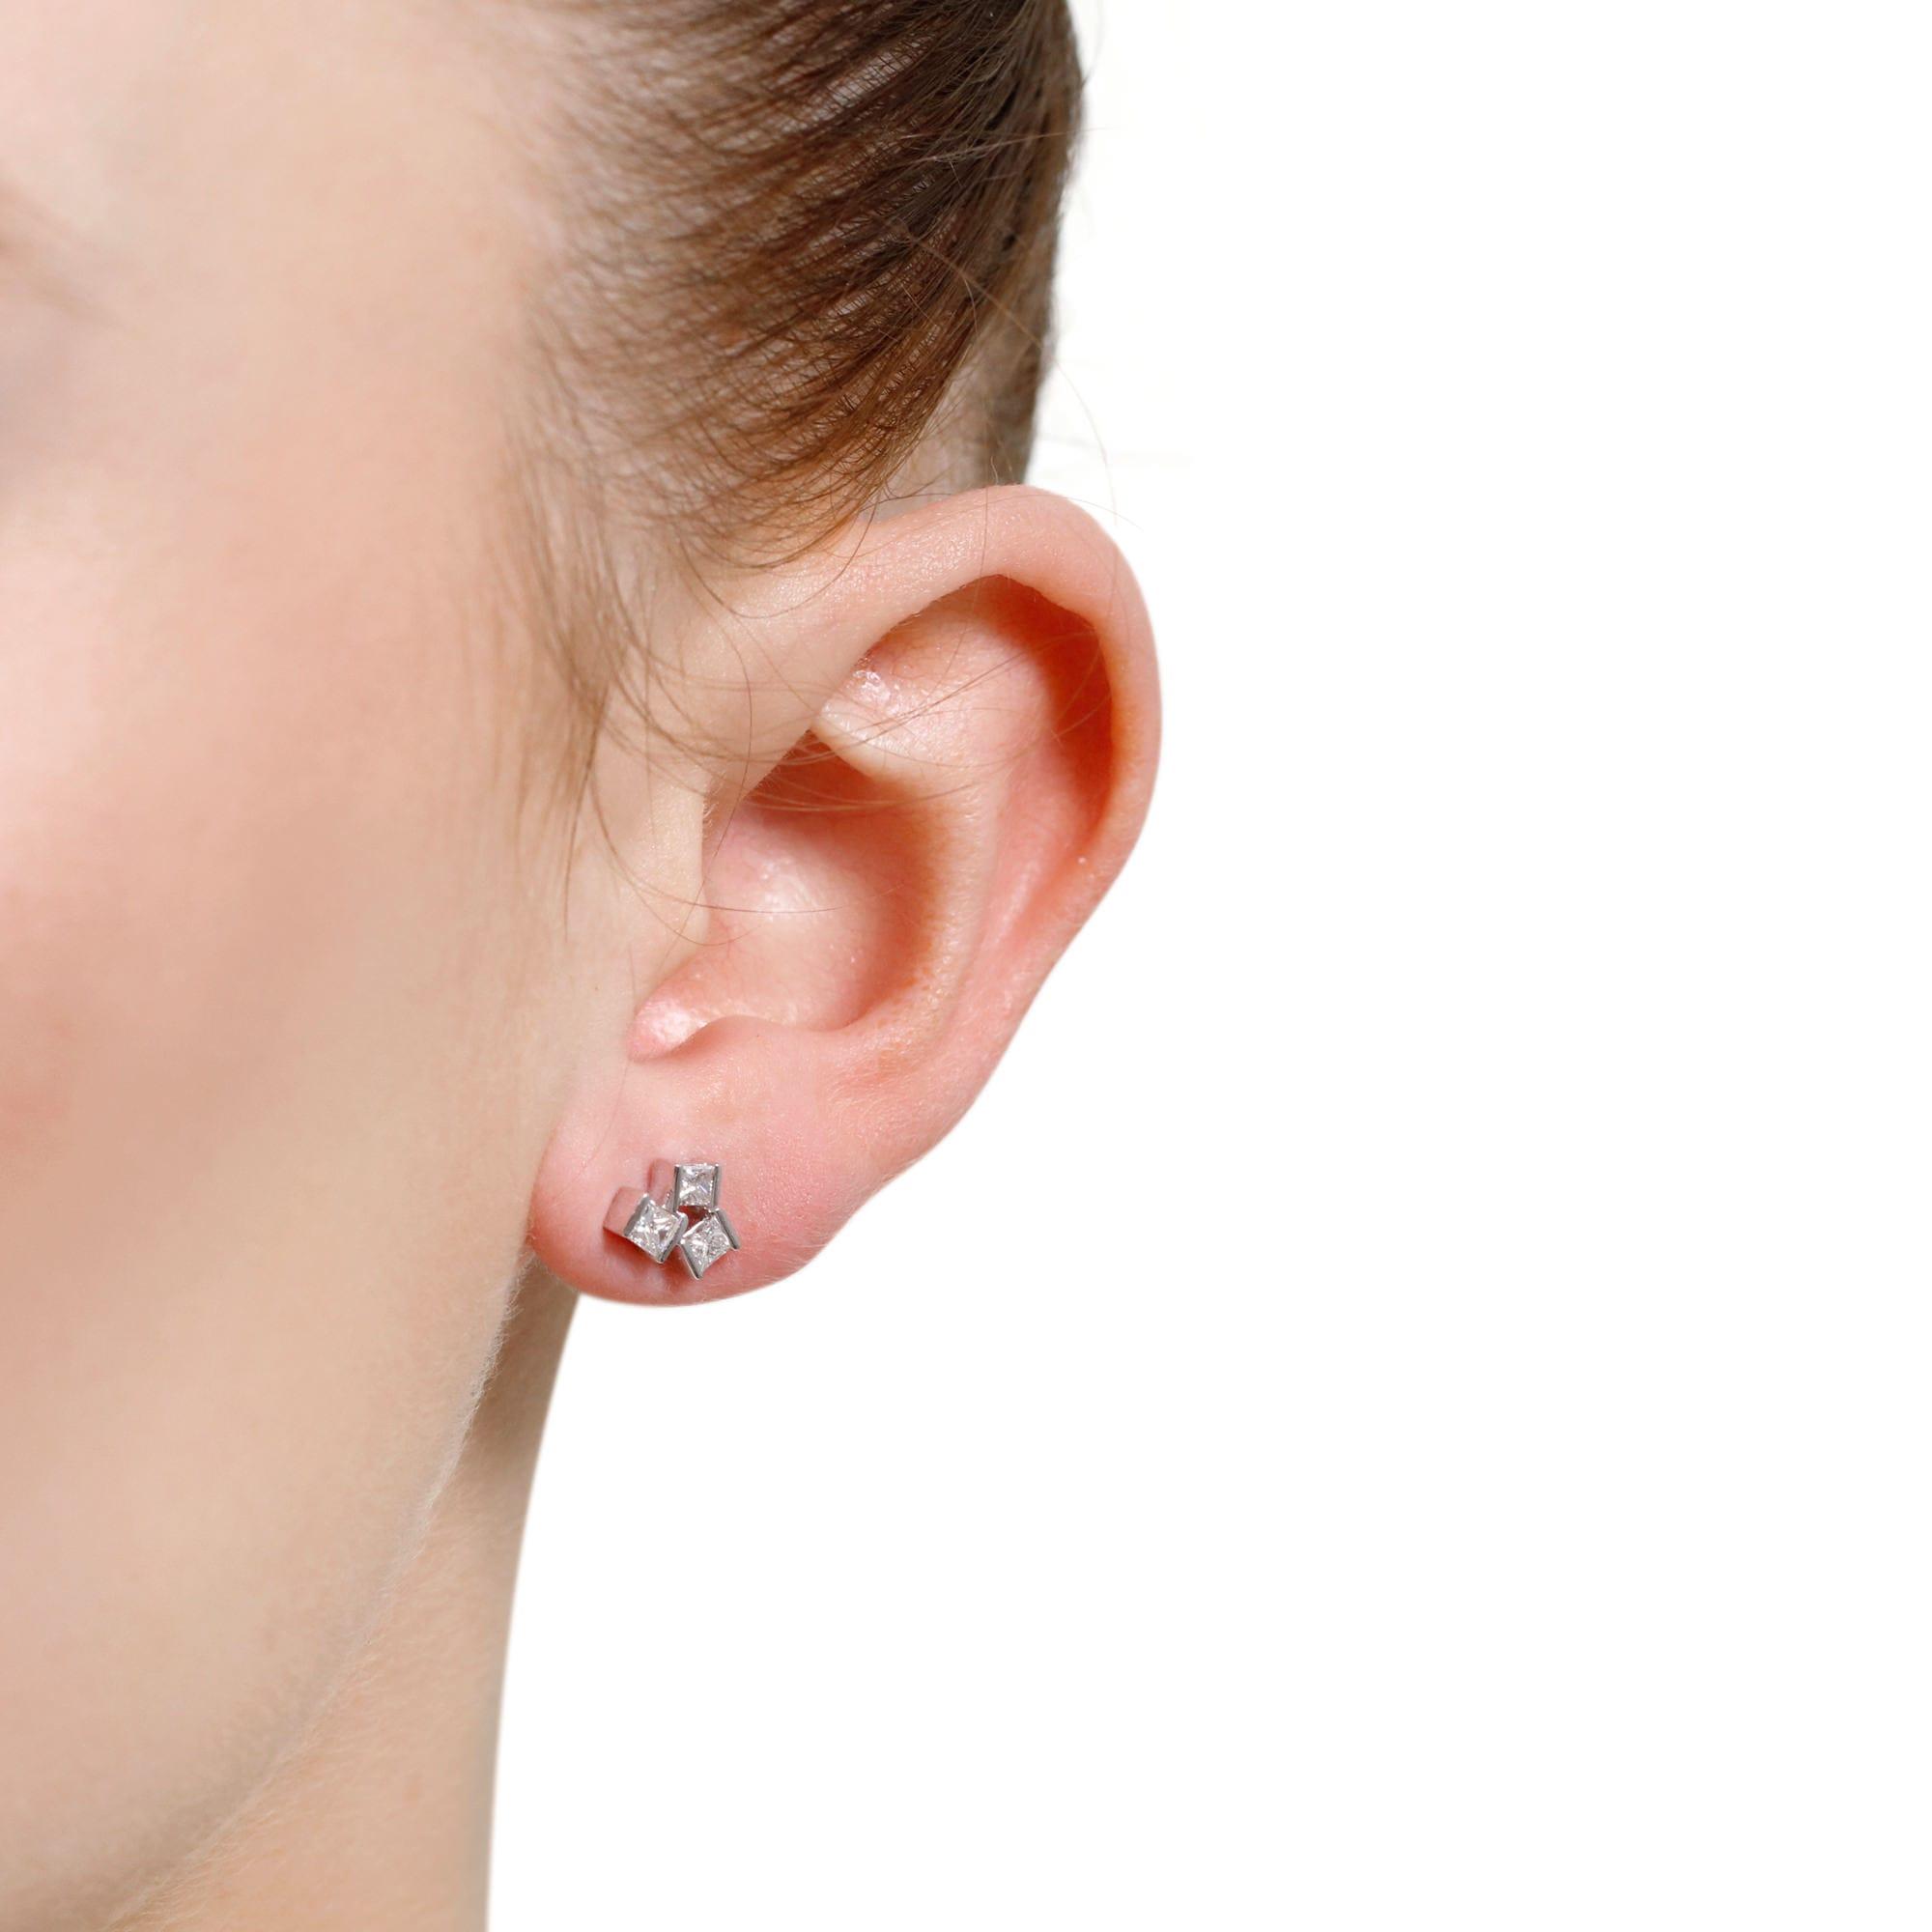 Hopscotch White Gold Small Diamond Stud Earrings